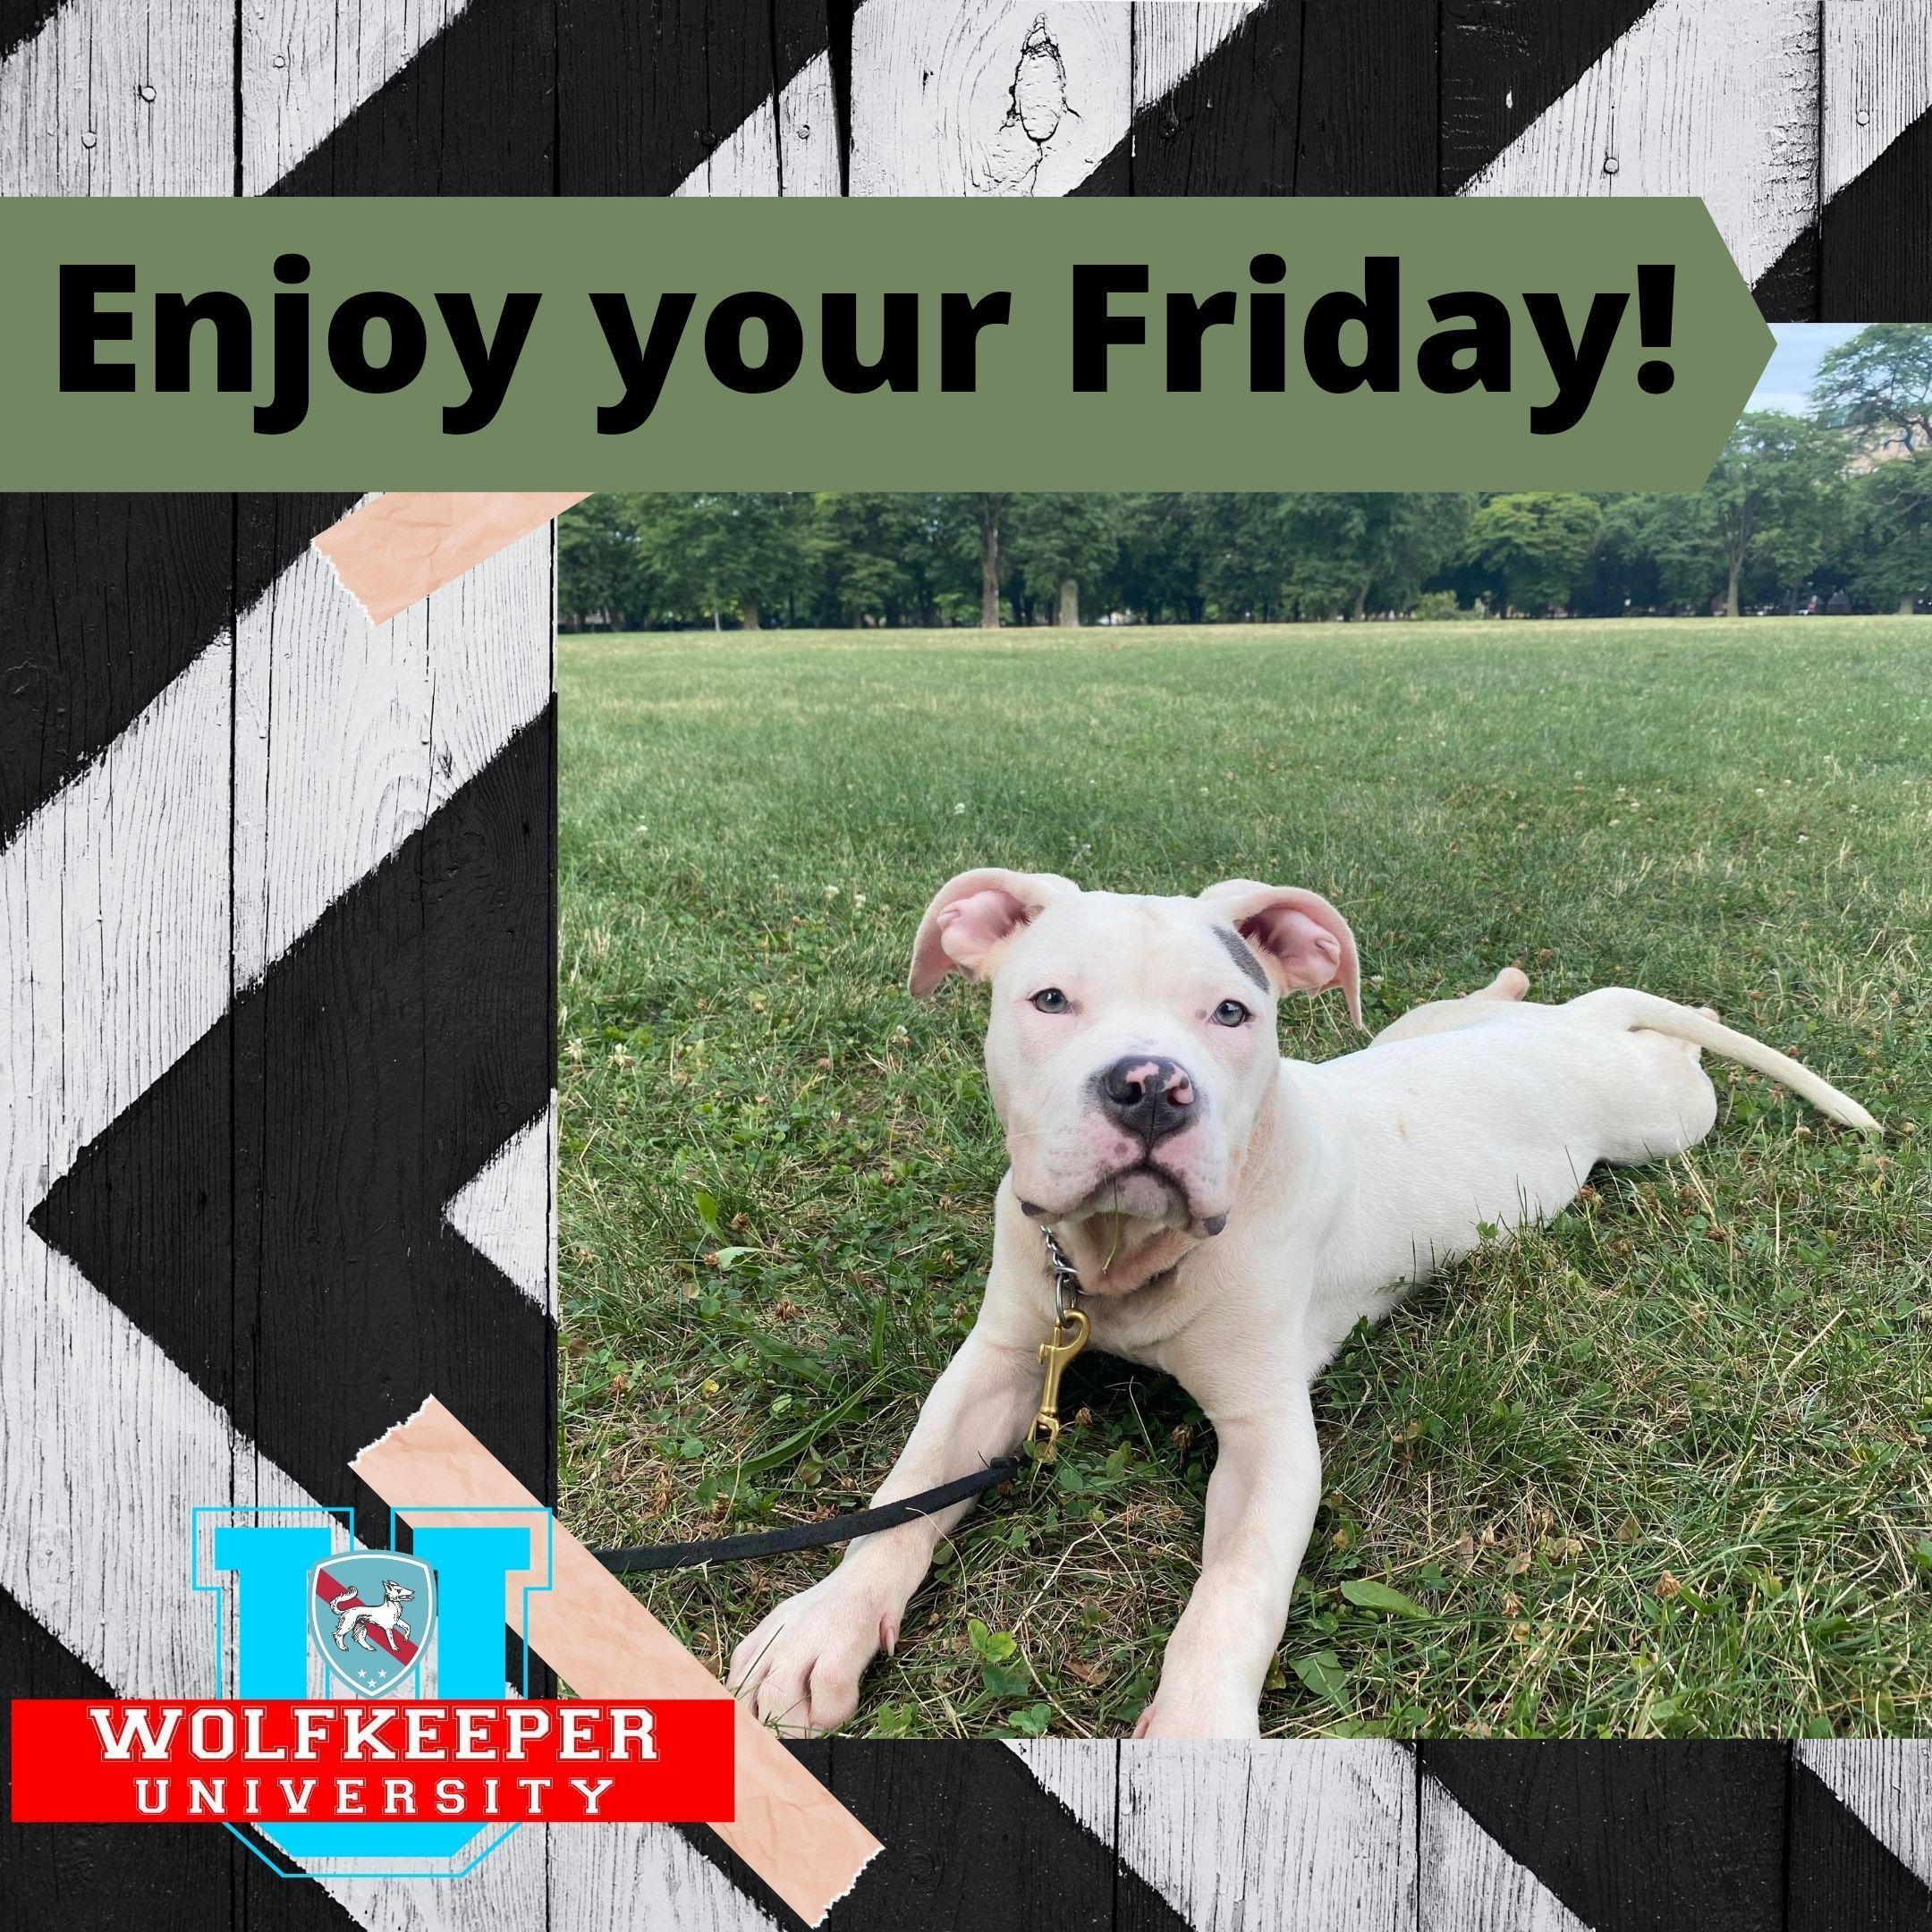 Thank God it's FRIDAY!!!😎 Wolfkeeperuniversity https